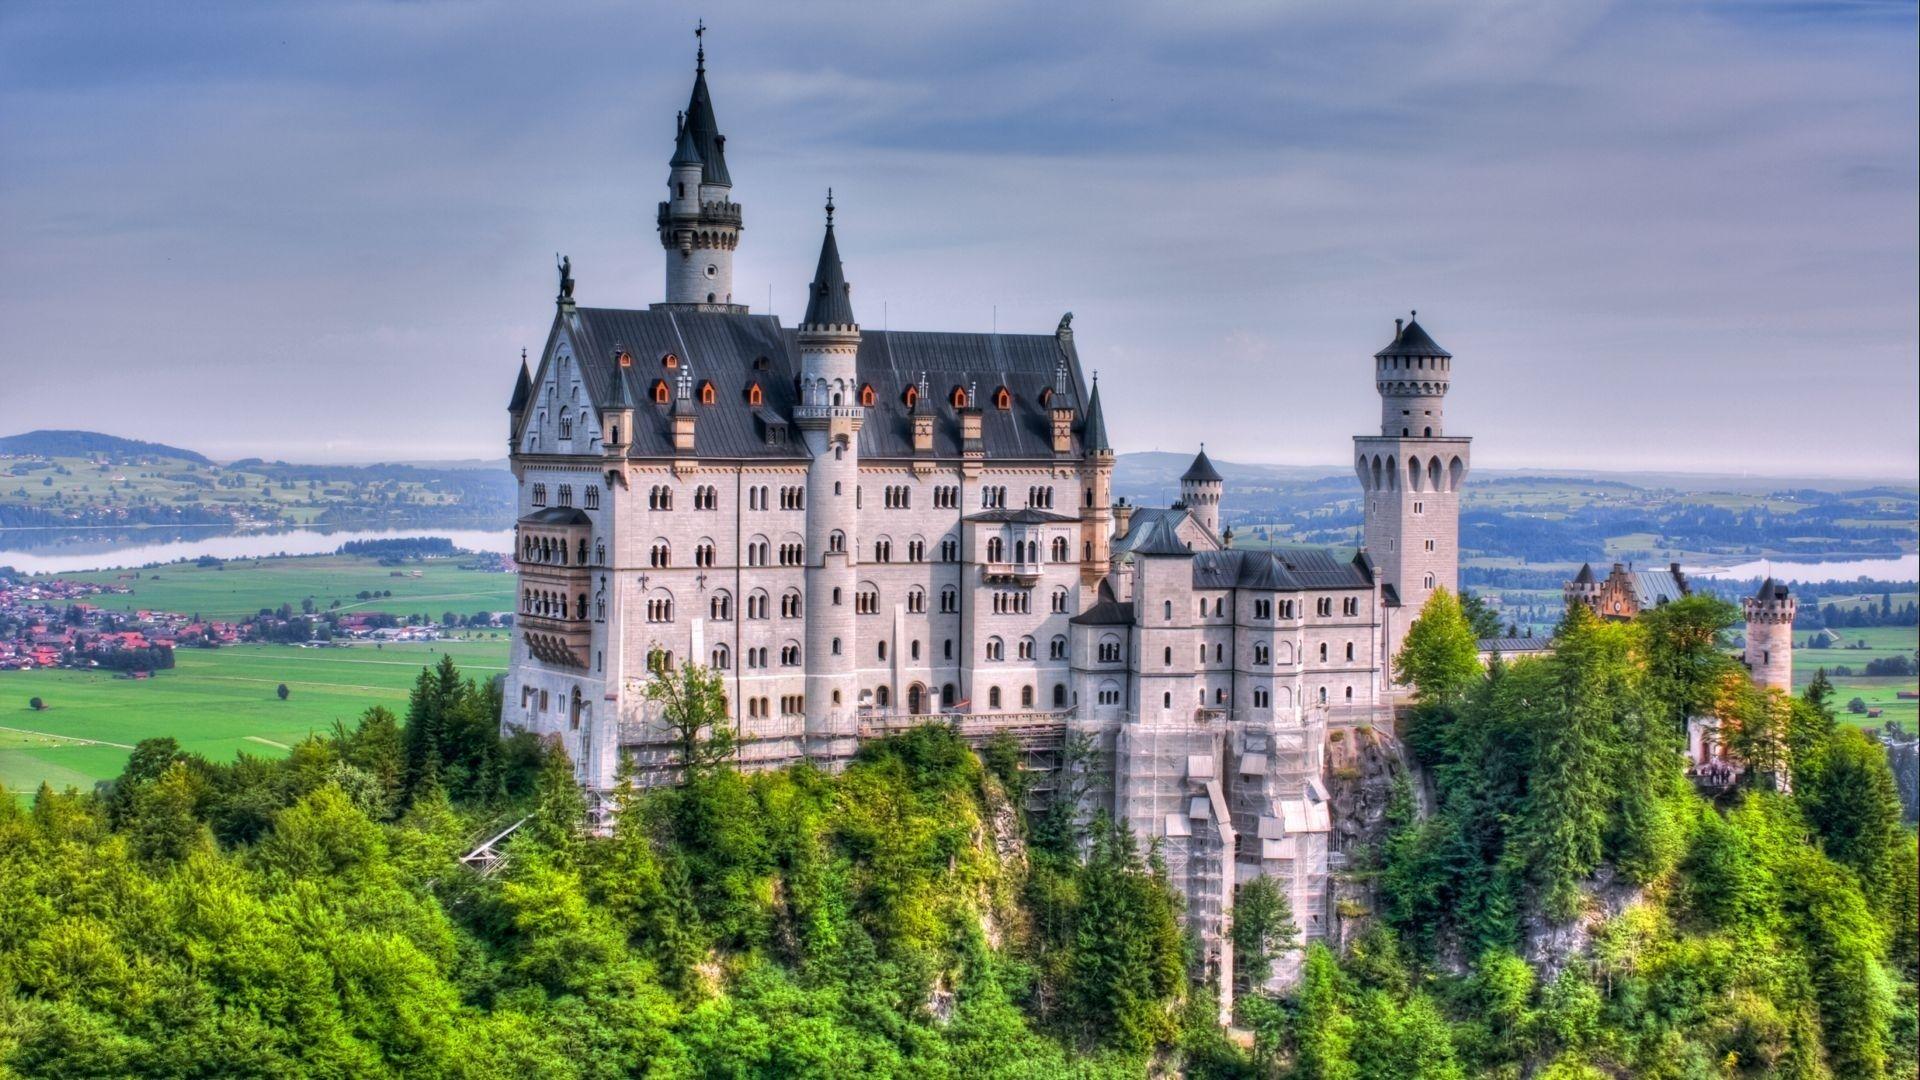 Neuschwanstein Castle De Neuschwanstein Castle Germany Castles Beautiful Castles